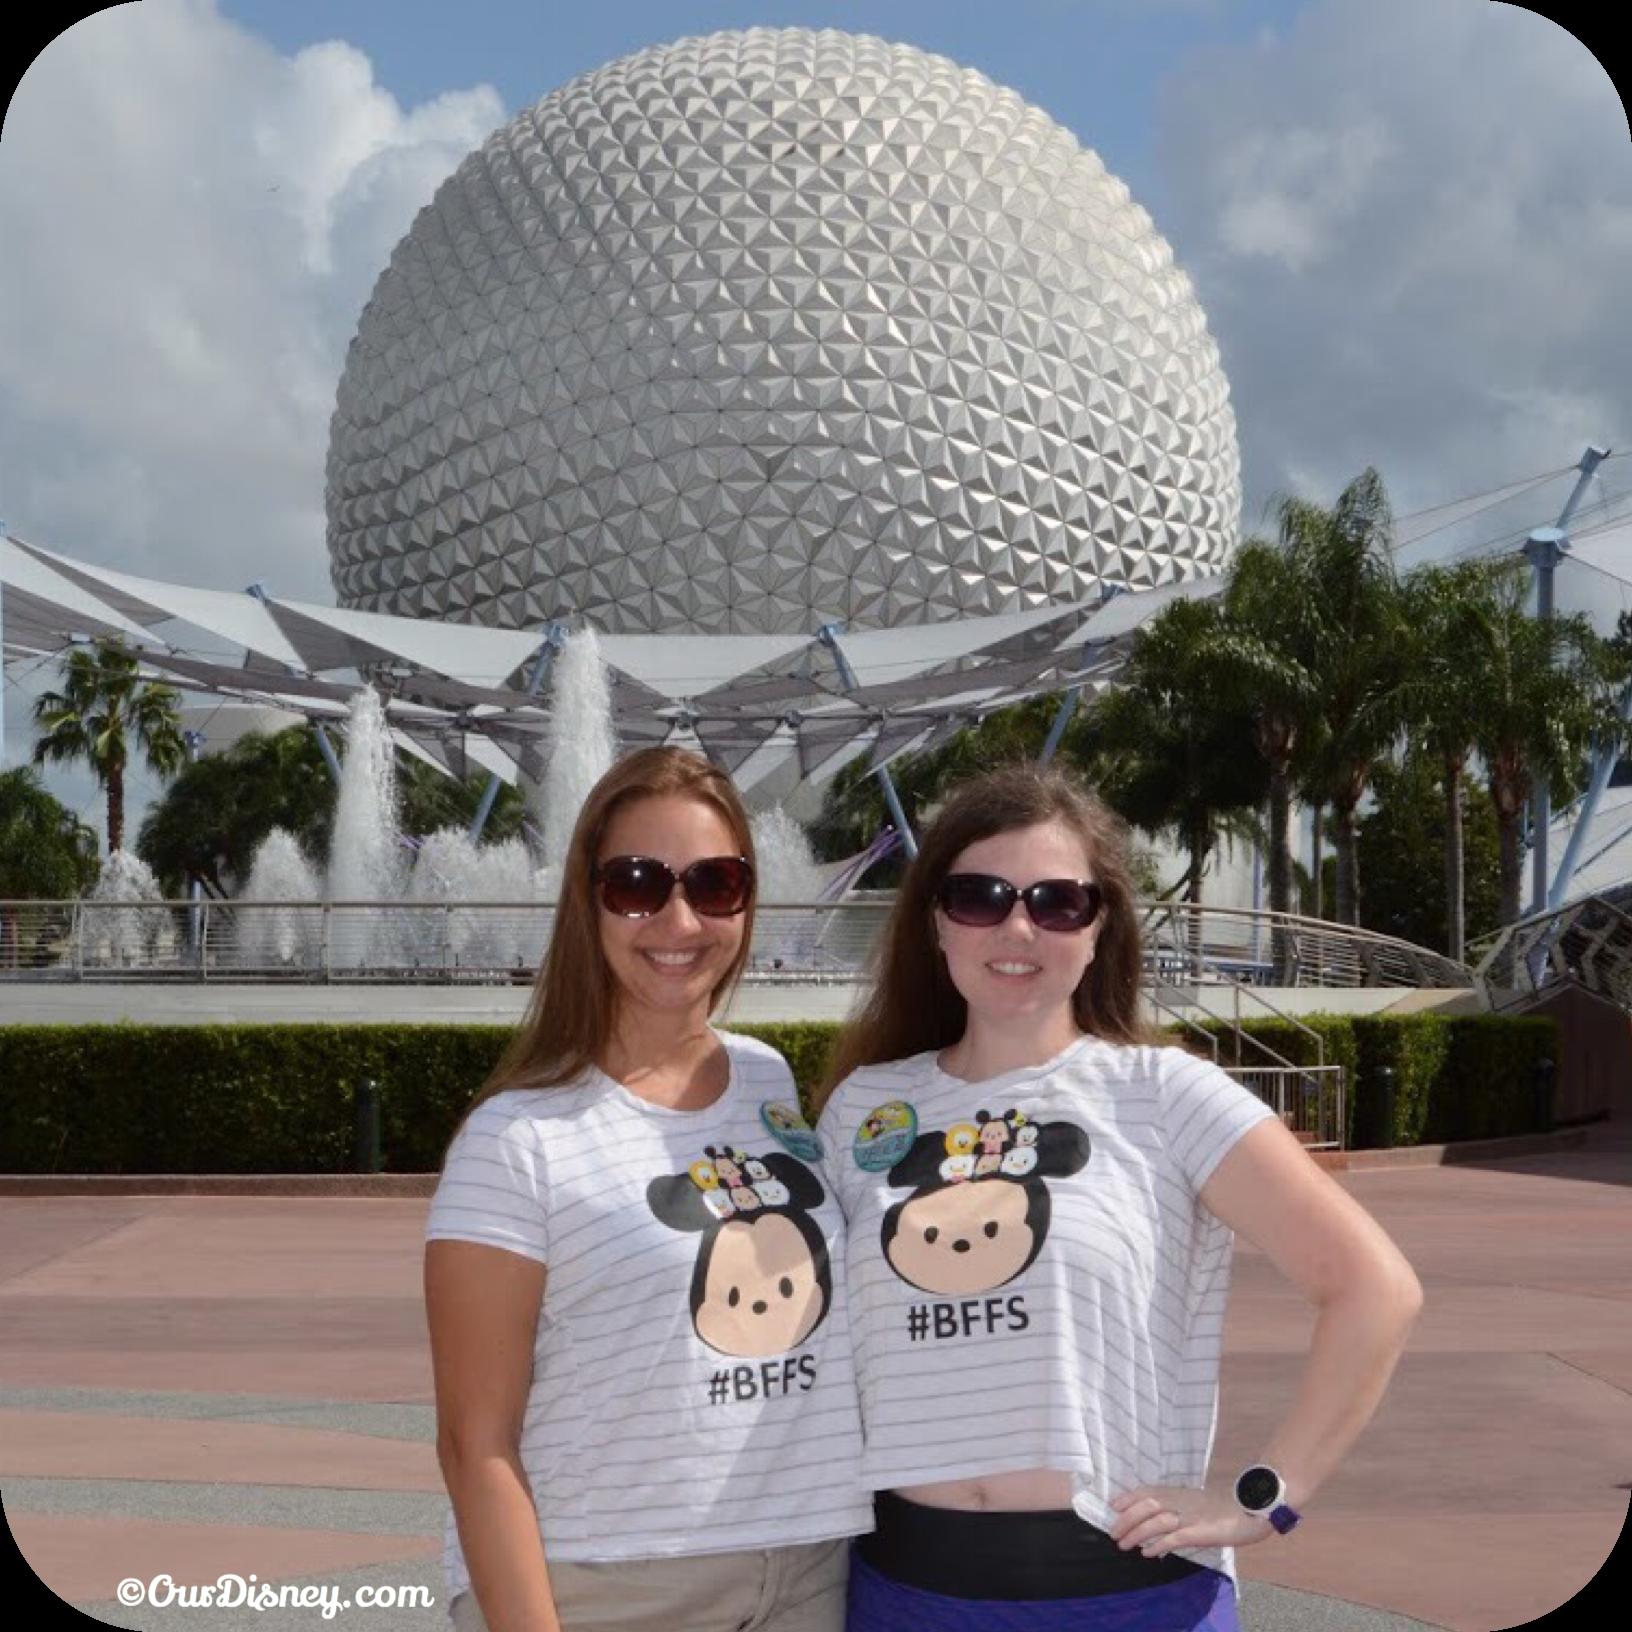 Our Disney